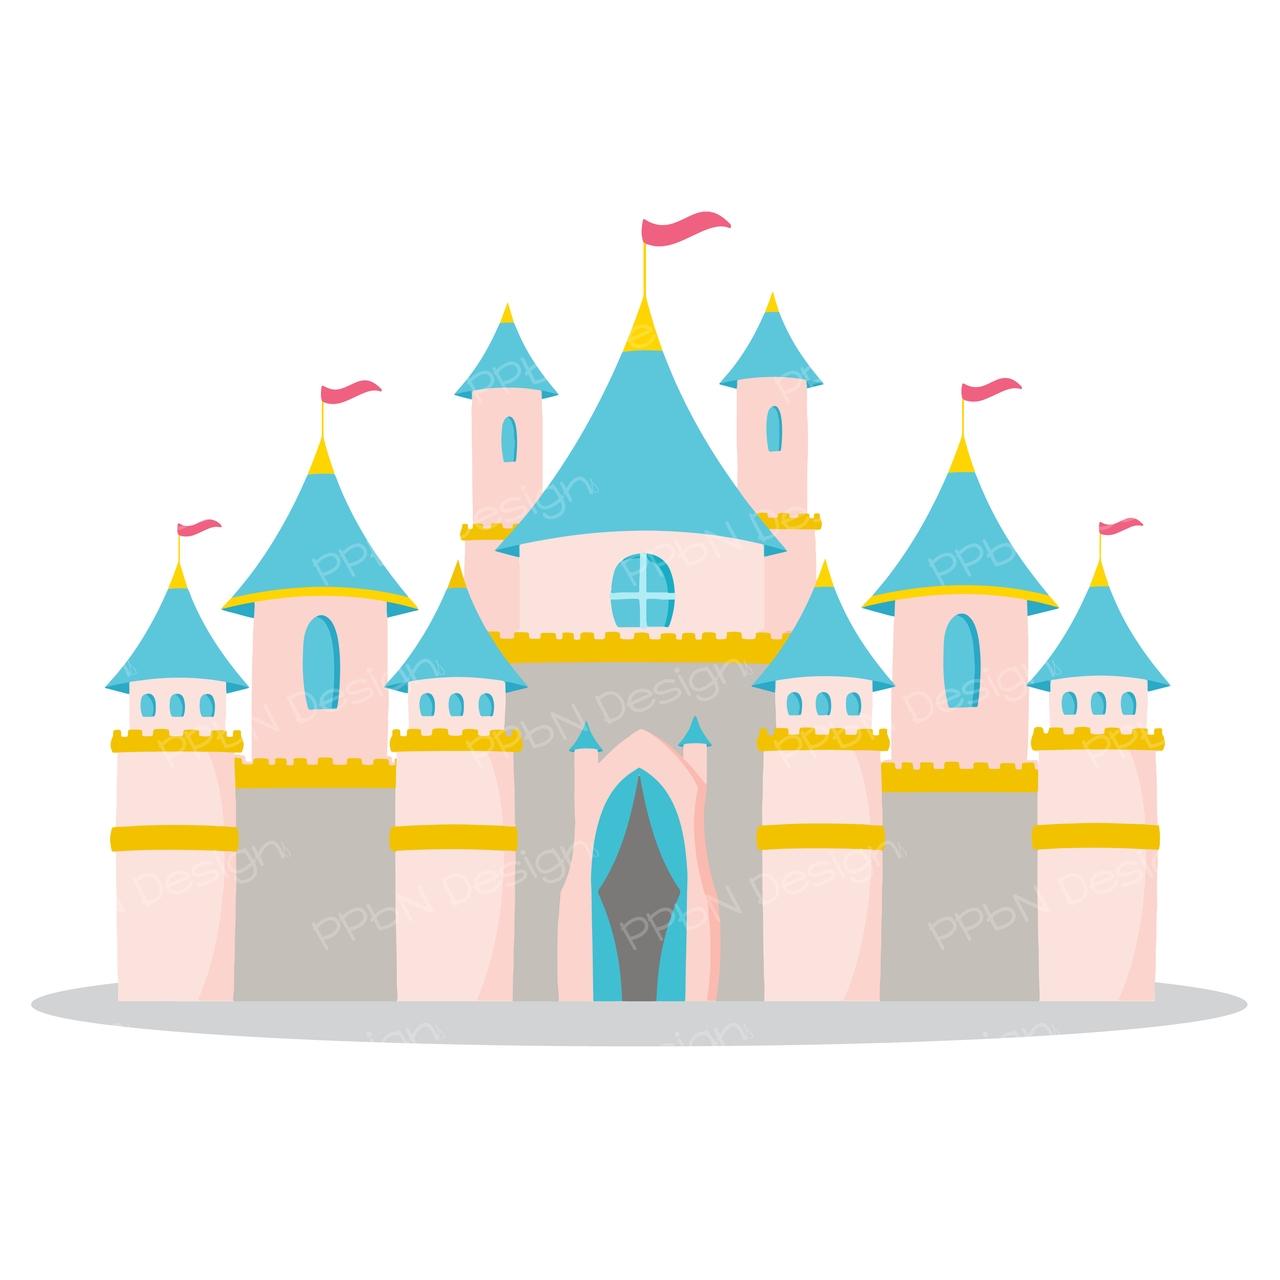 Disneyland clipart. Unique collection digital g